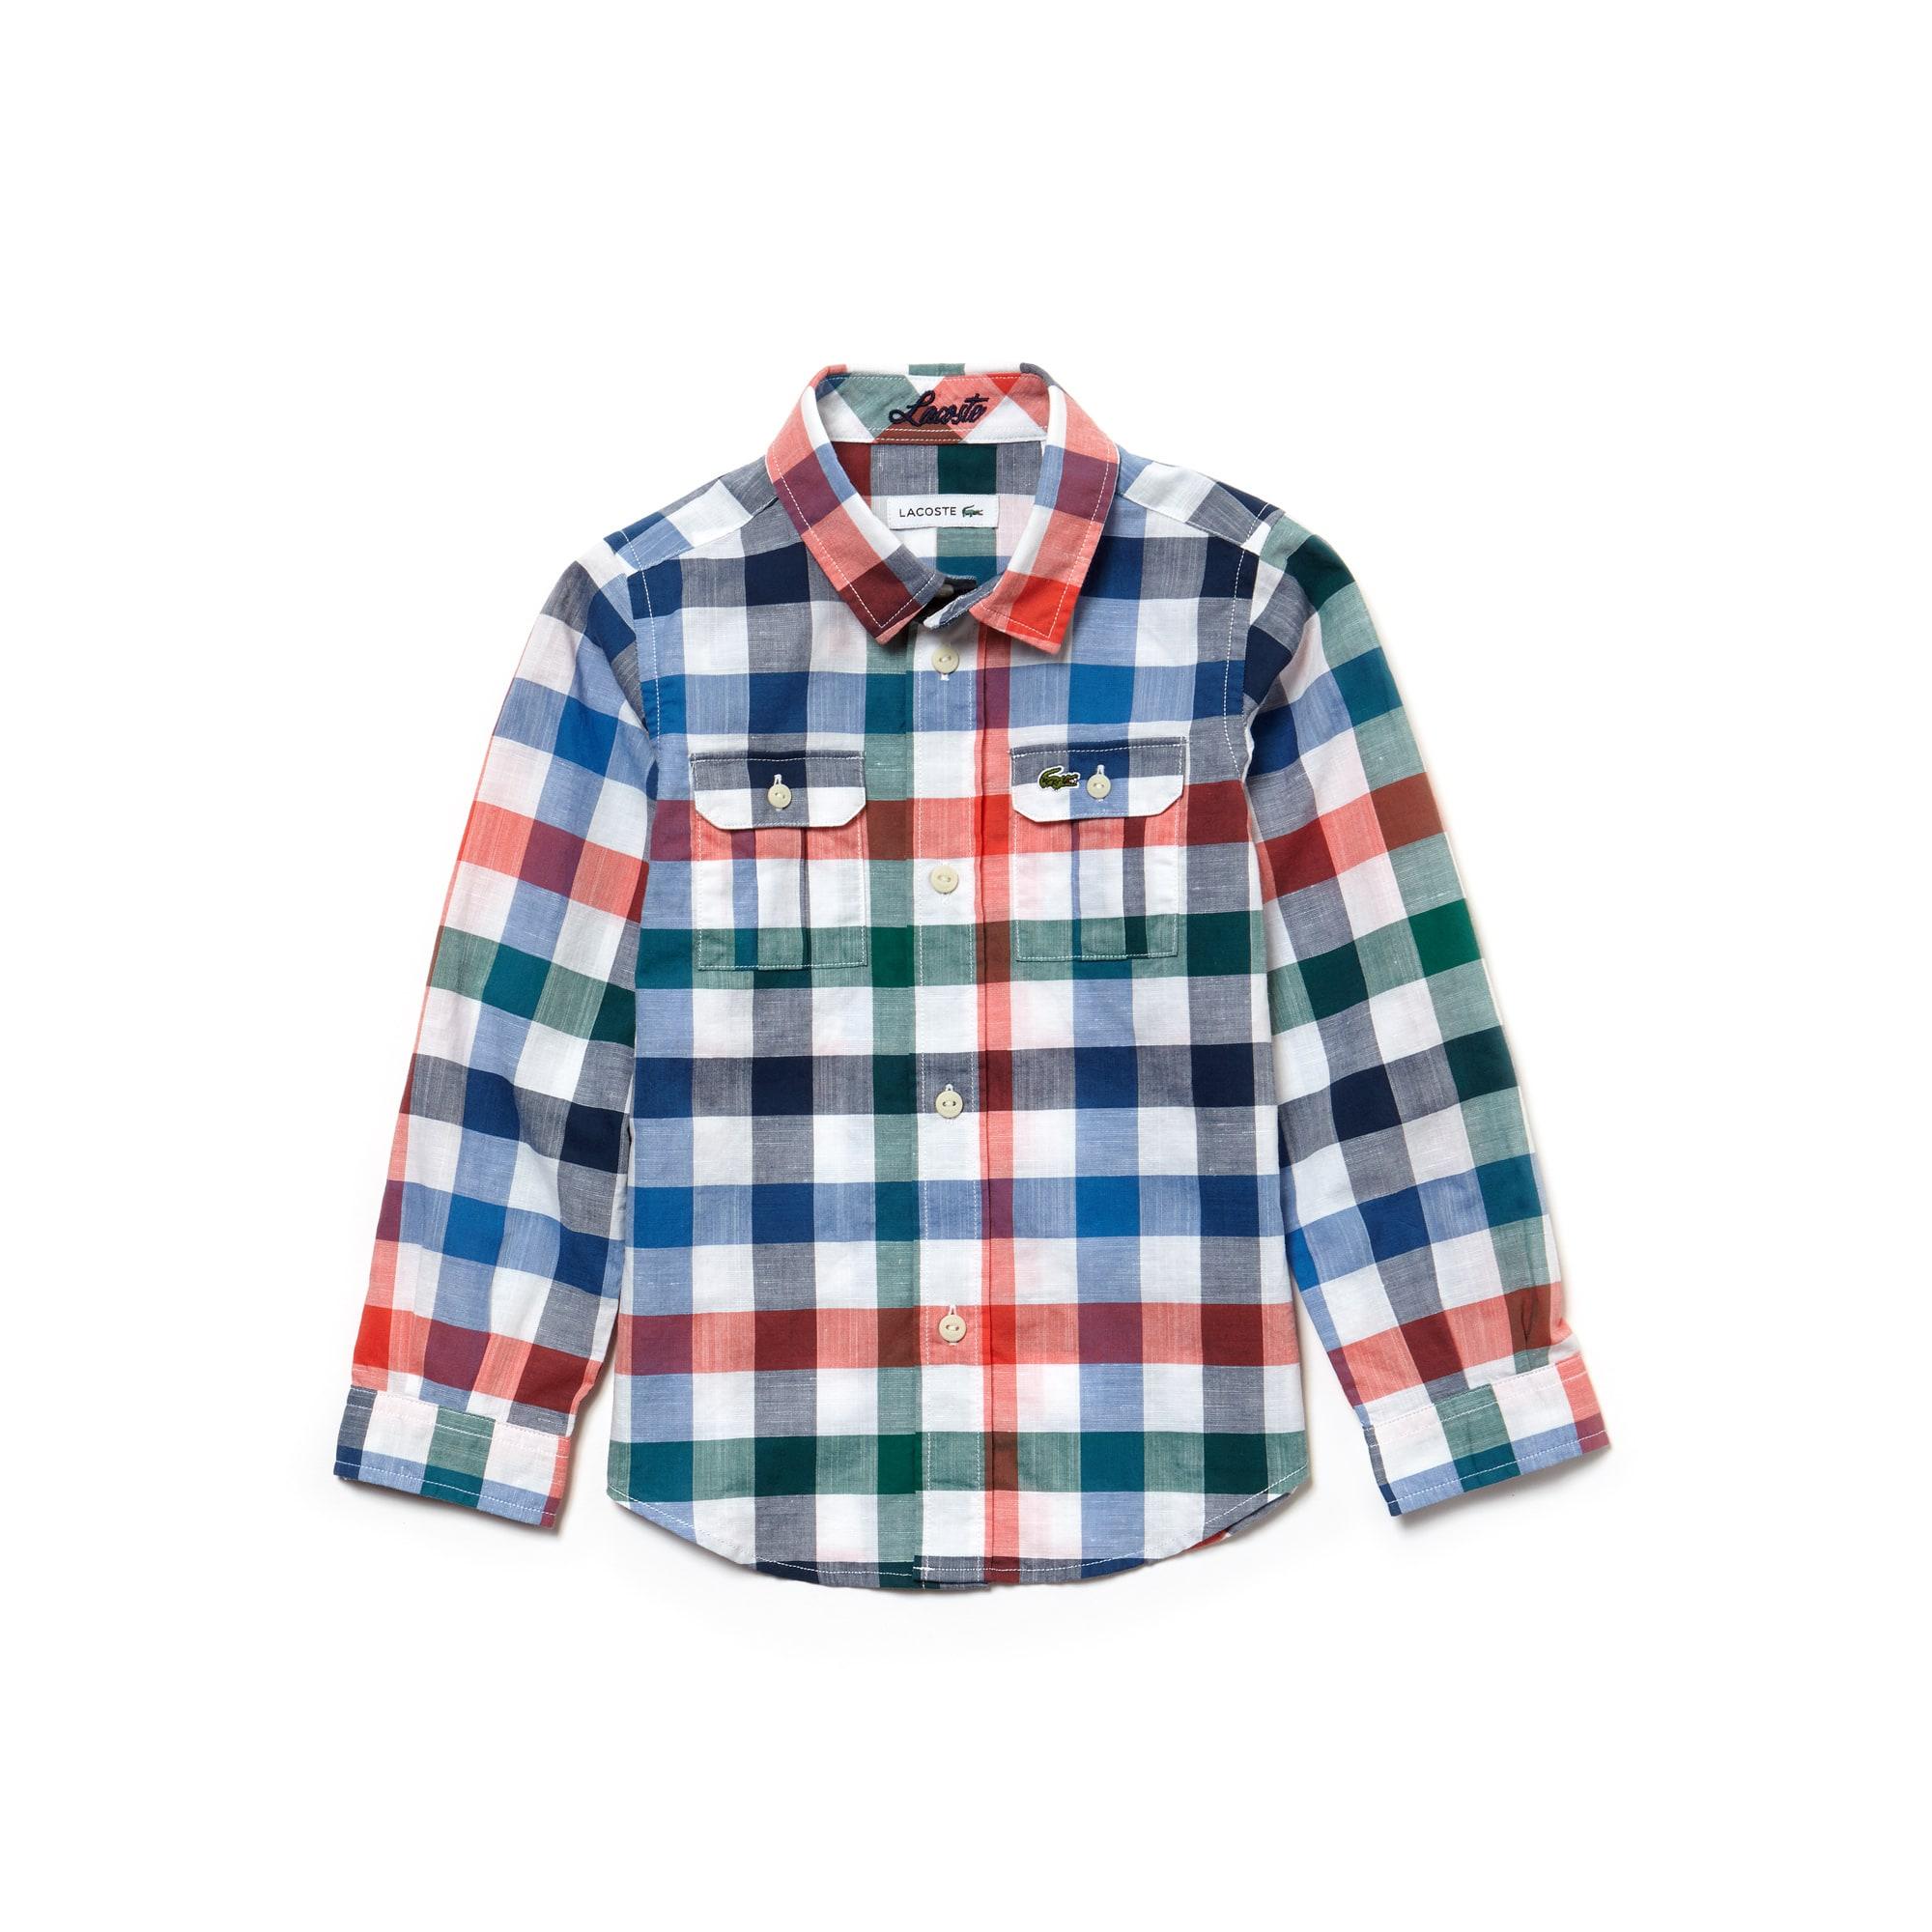 Boys' Check Cotton And Linen Poplin Shirt